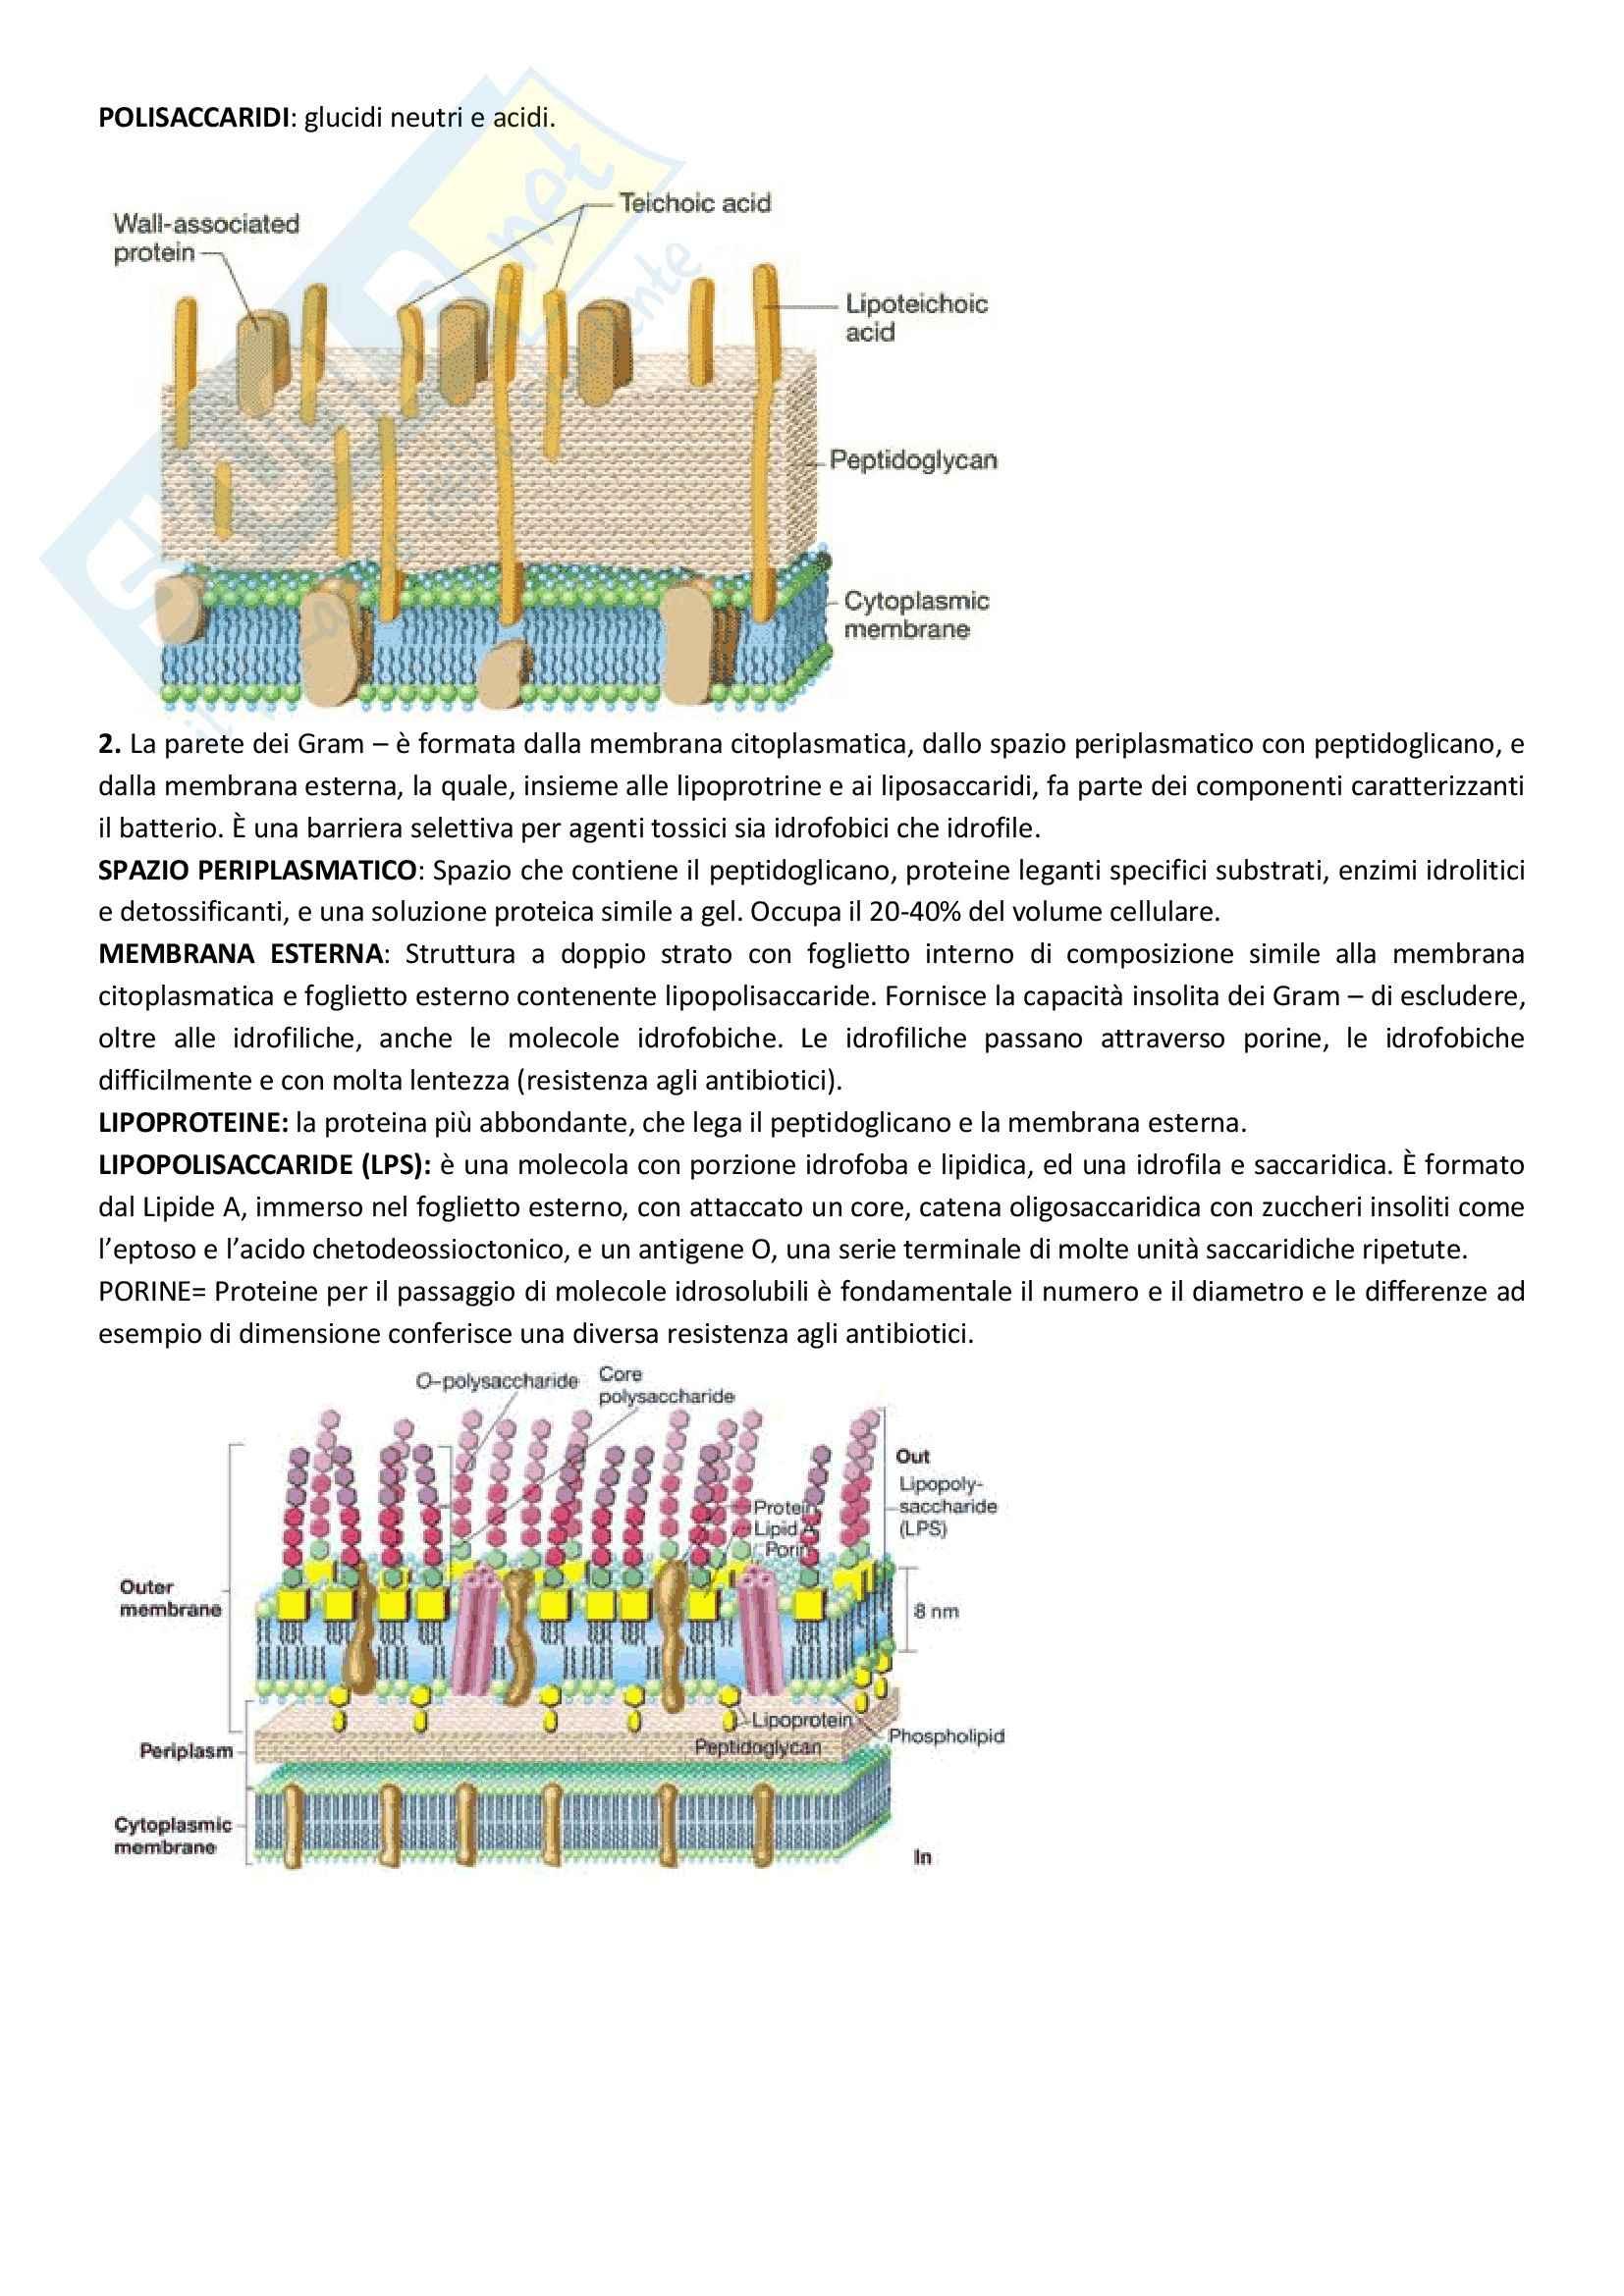 Microbiologia - Appunti Pag. 2